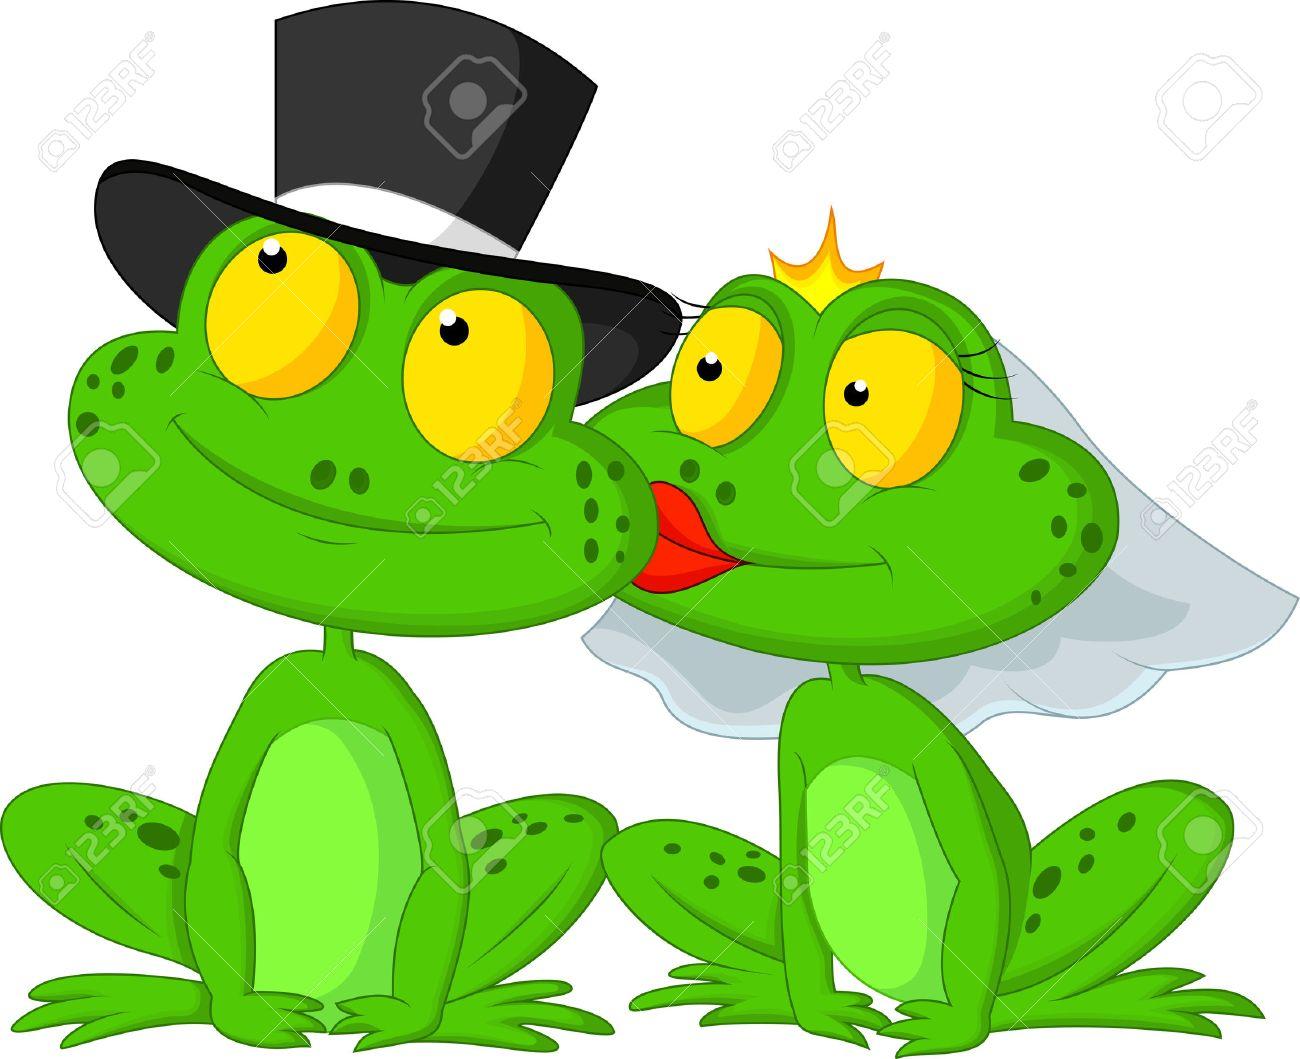 Married frog cartoon kissing - 23007389